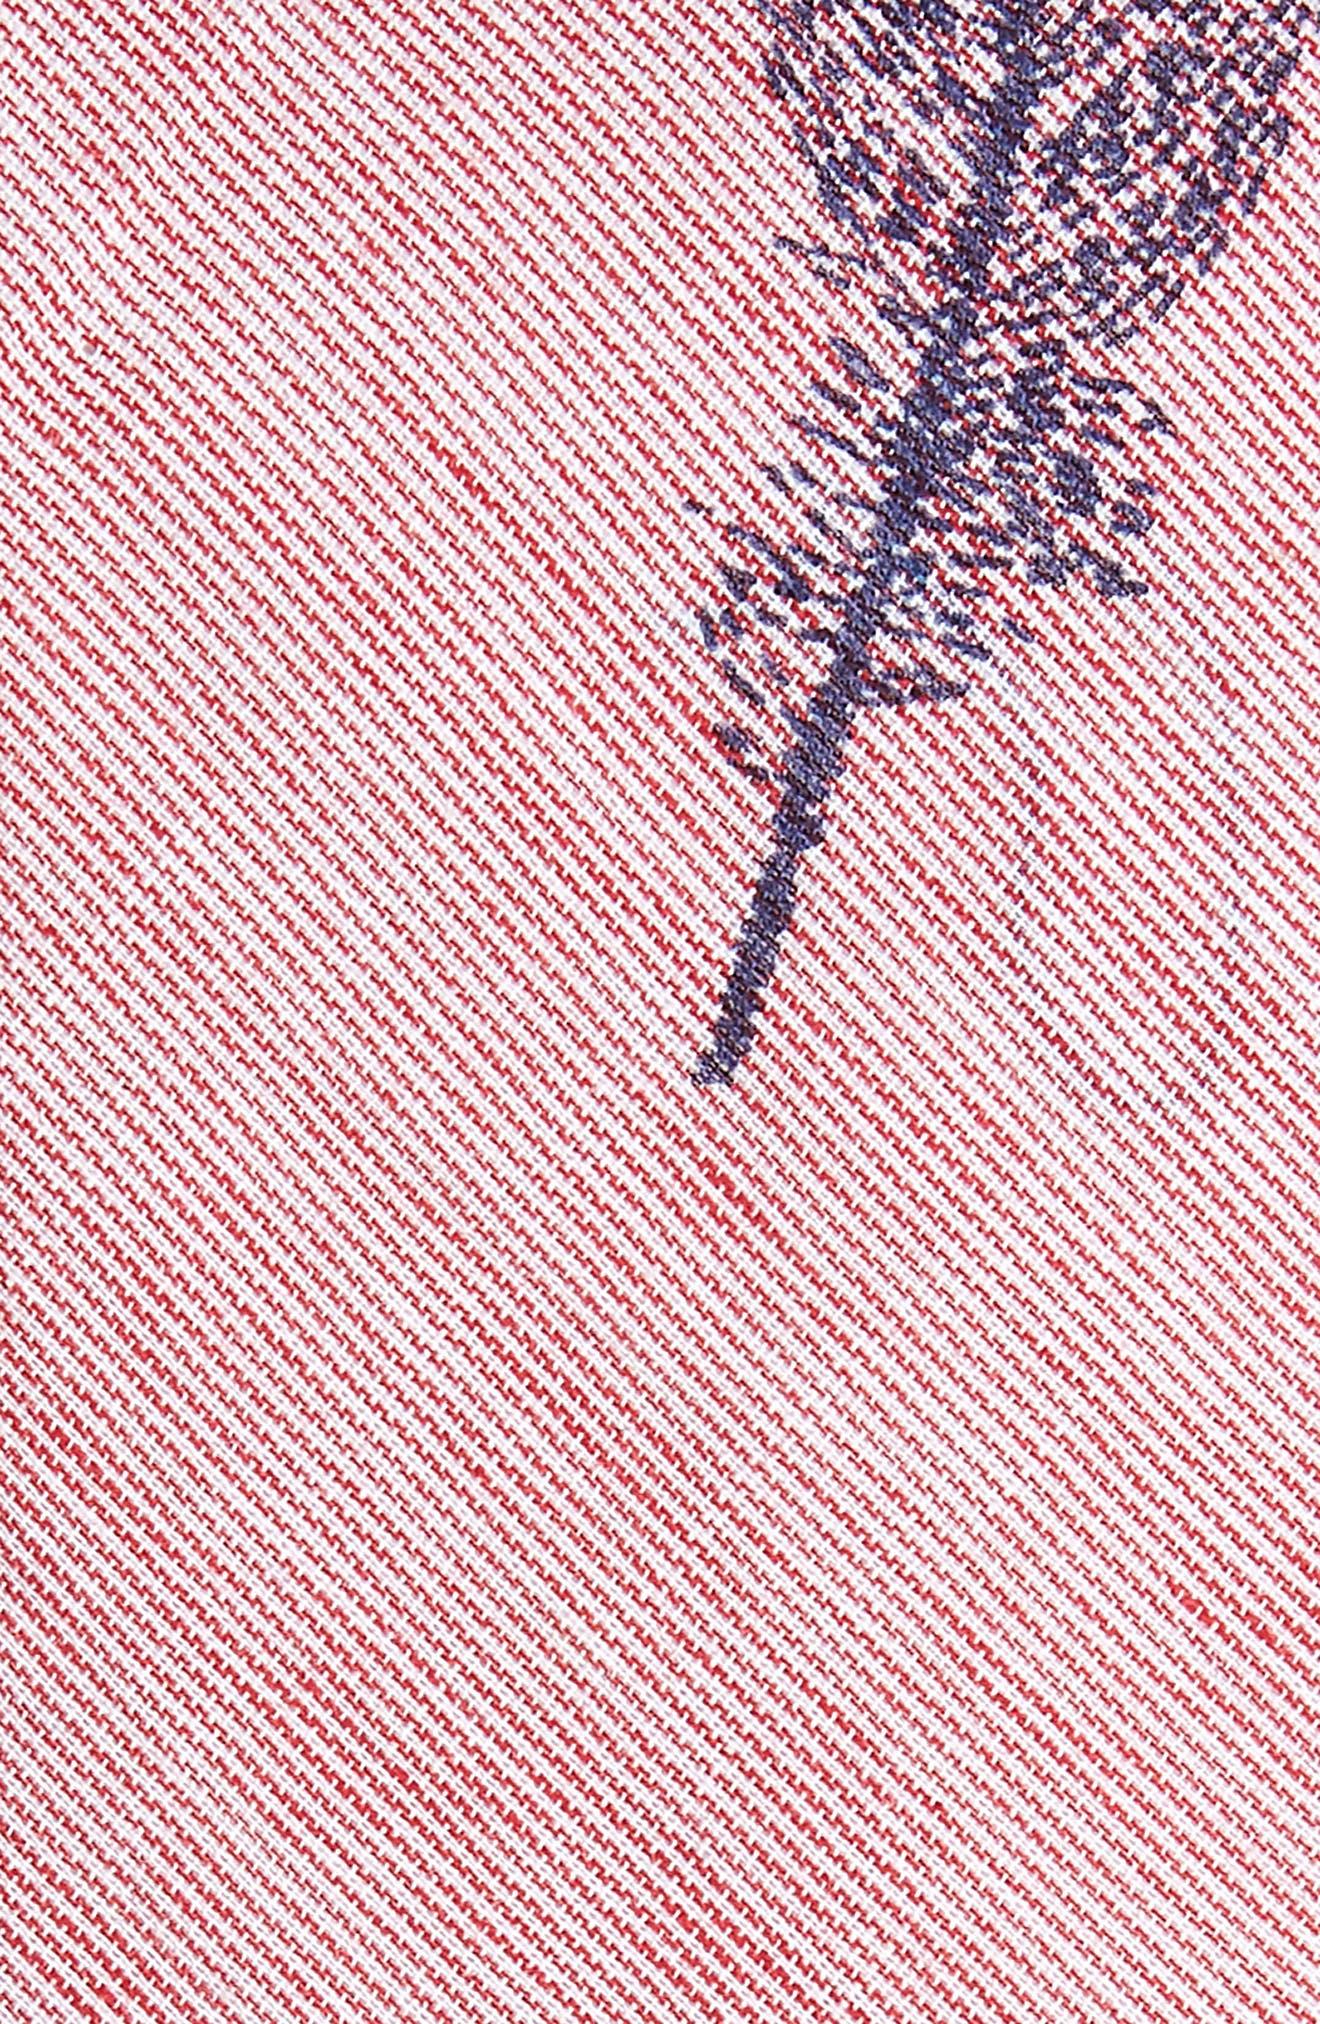 Glenvale Print Cotton Skinny Tie,                             Alternate thumbnail 2, color,                             Red